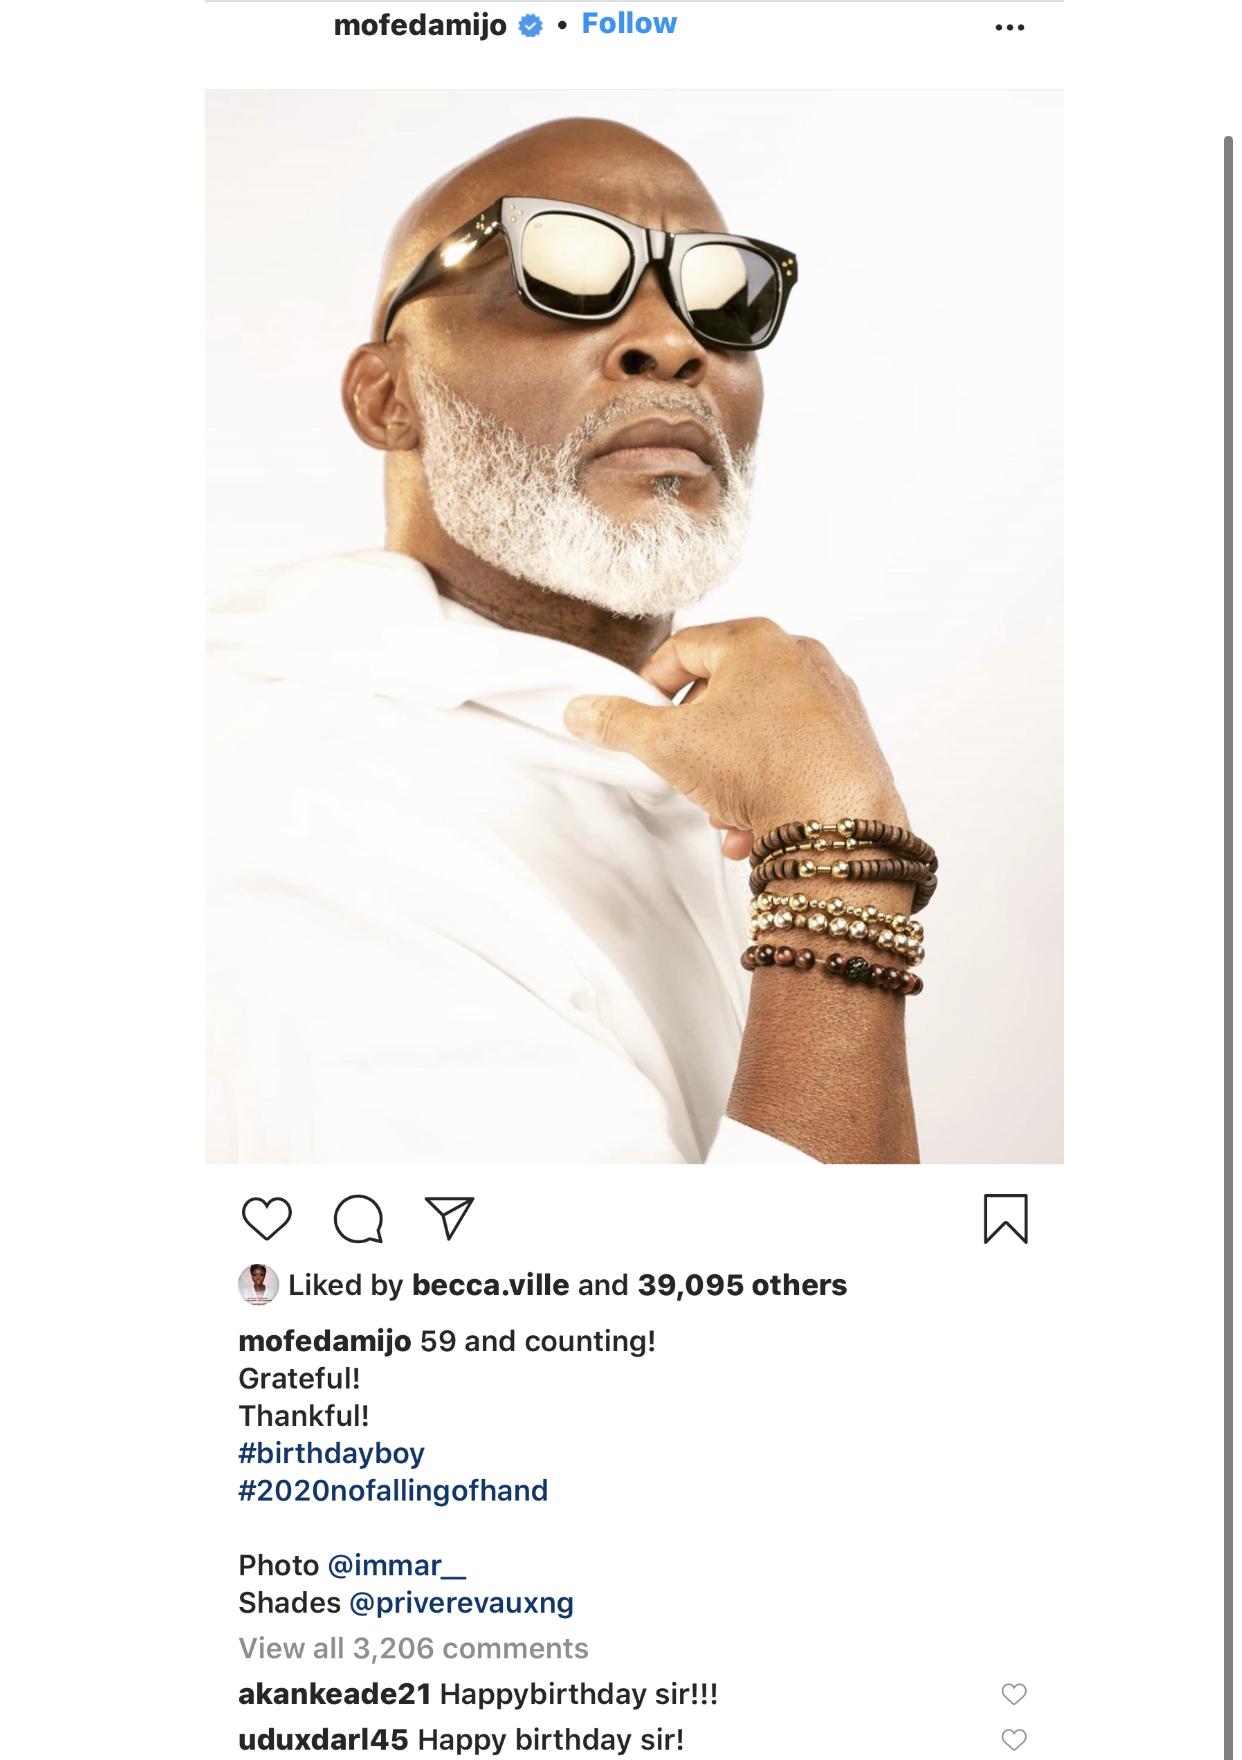 The actor's birthday post